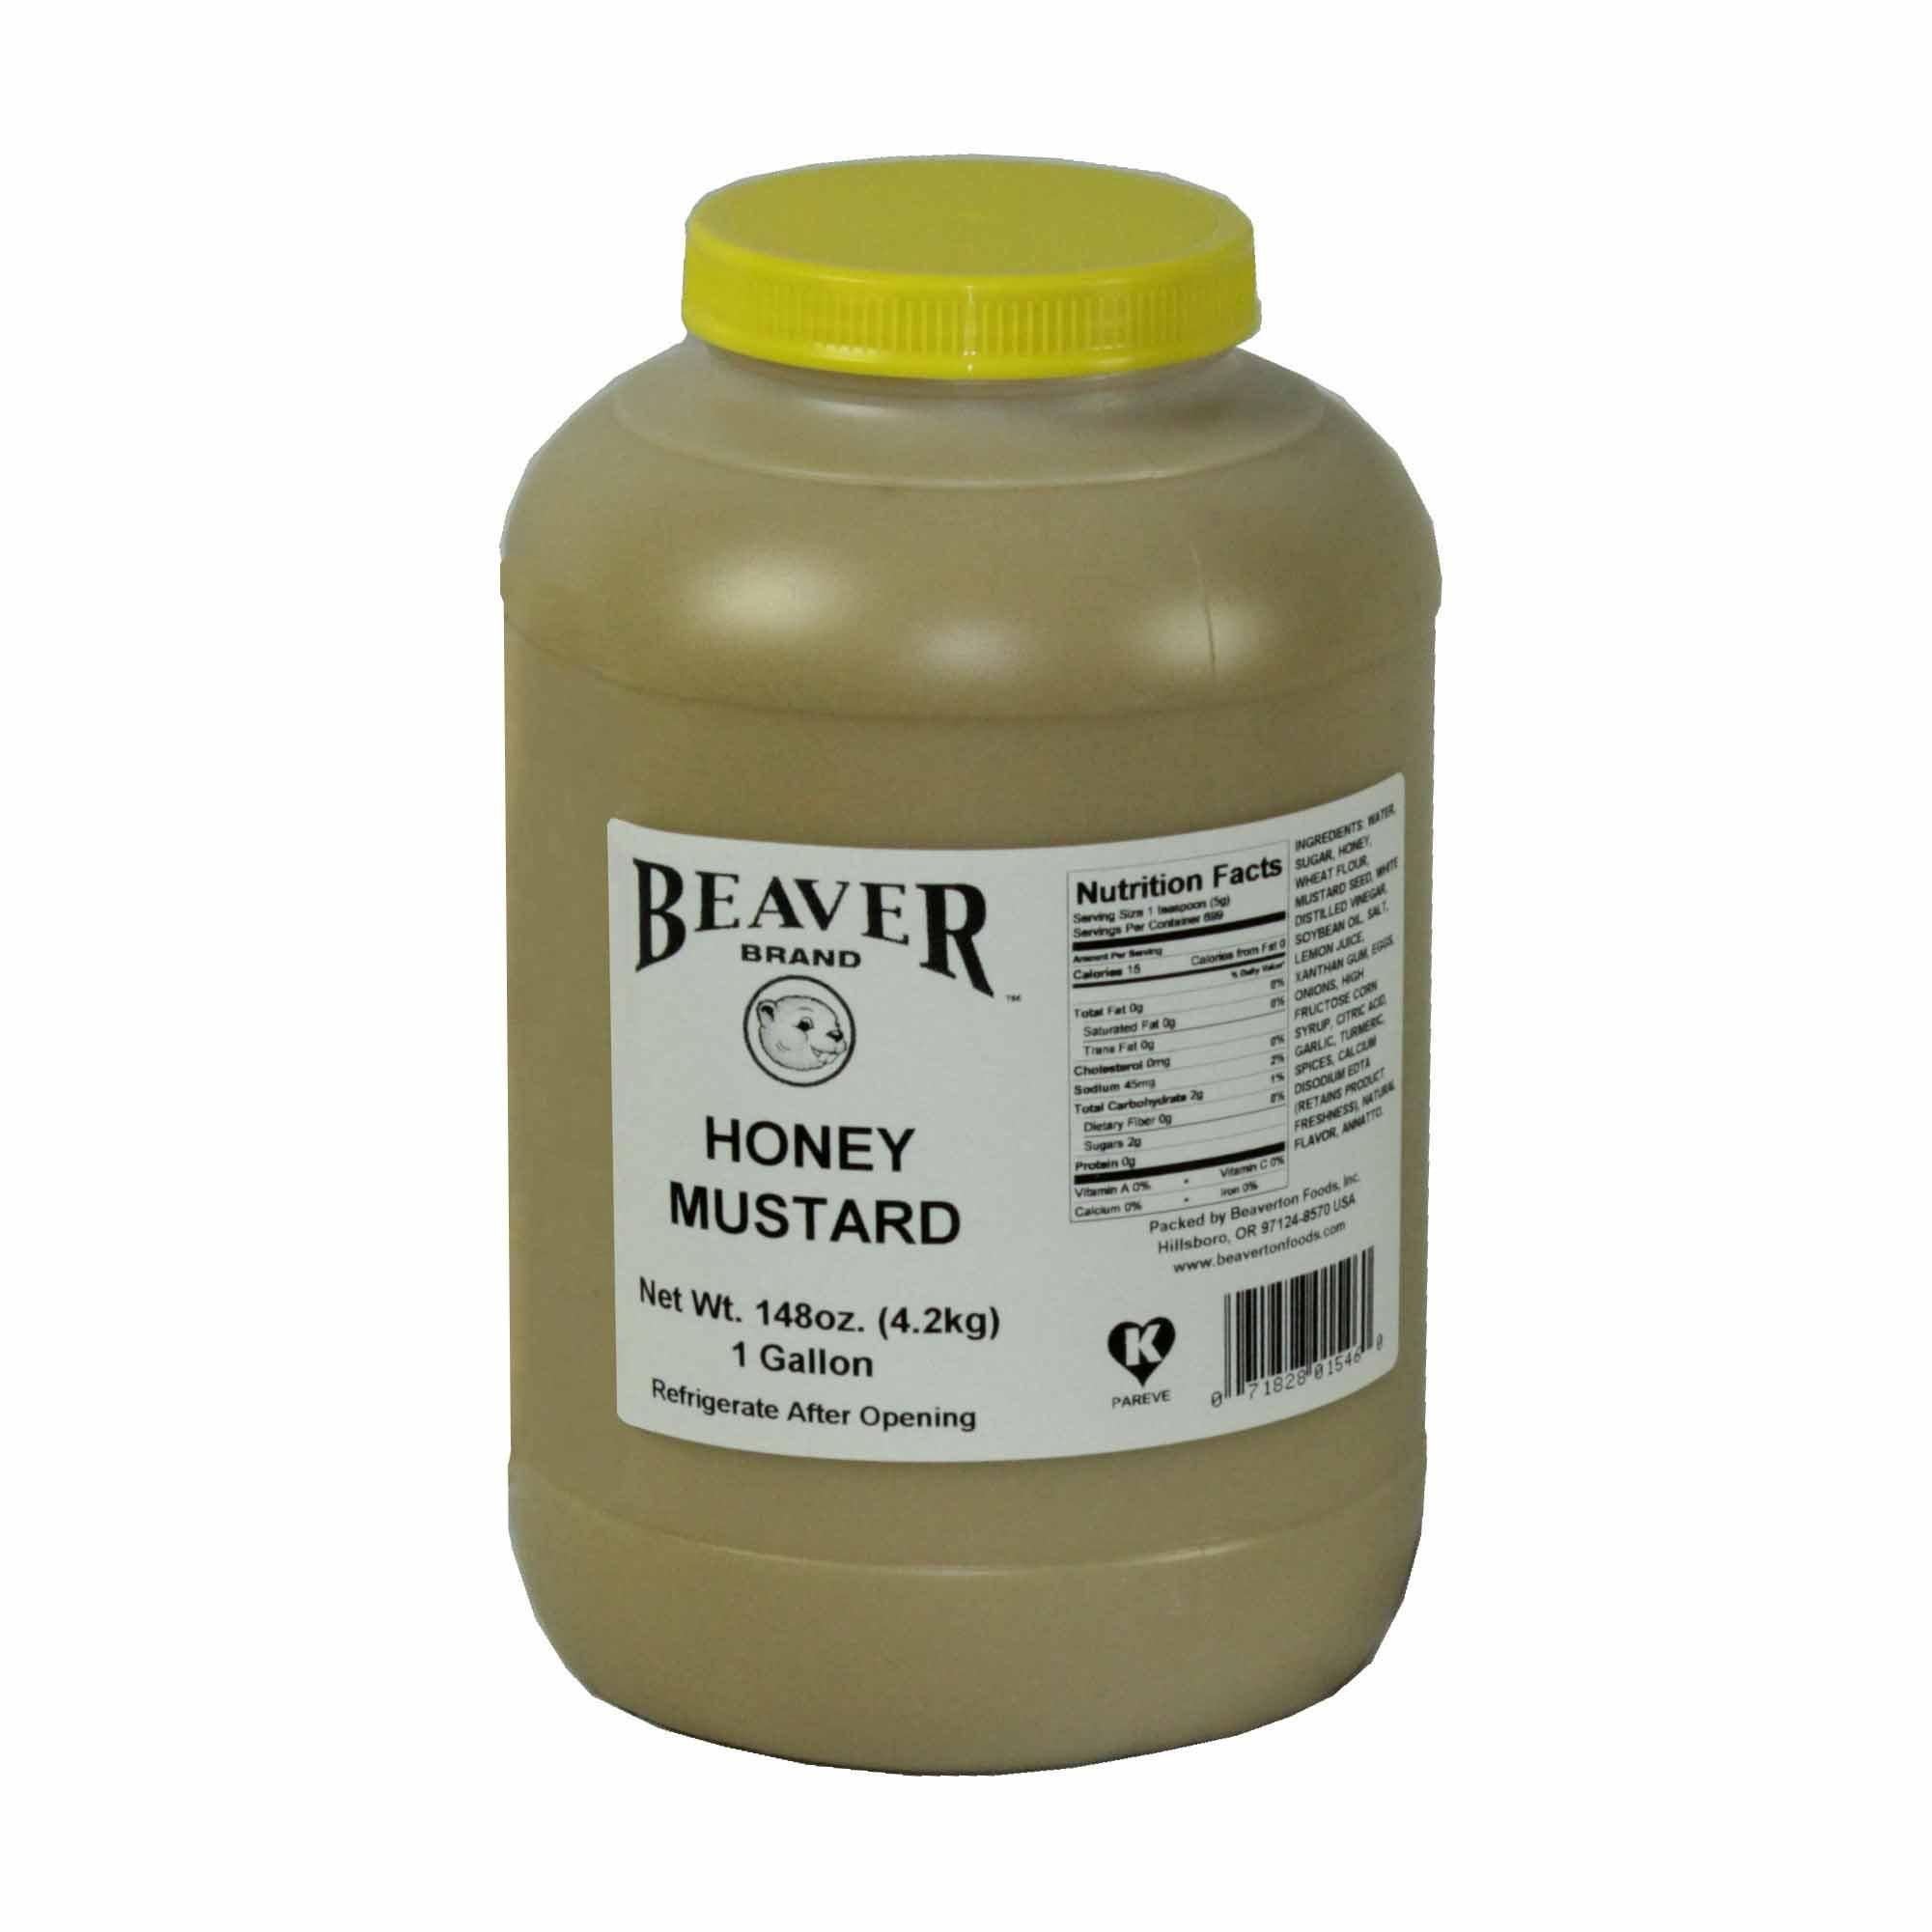 Beaver, Honey Mustard 9.25 lb (4 count) by Beaver